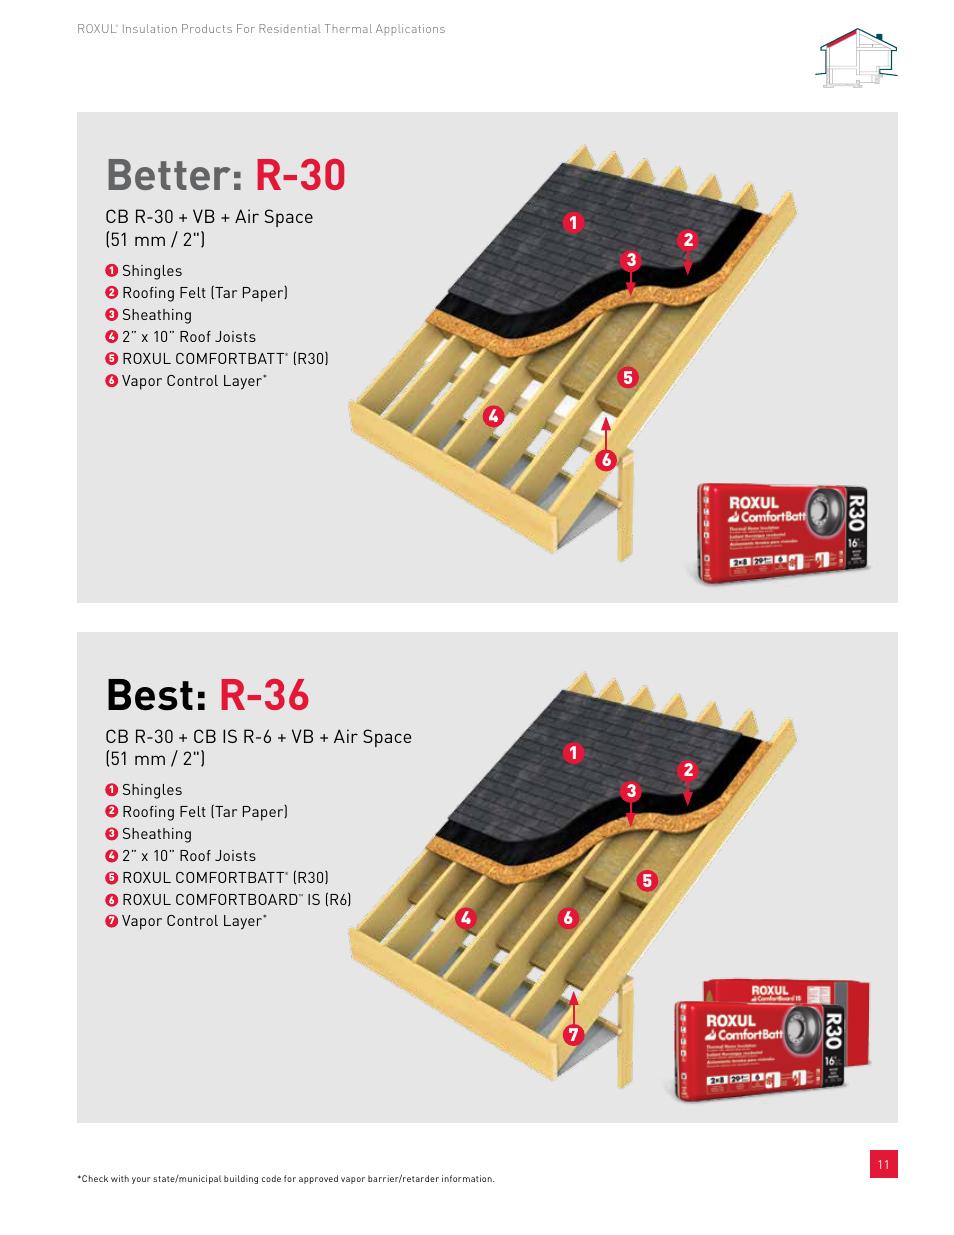 Better: r-30, Best: r-36 | Roxul ComfortBatt User Manual